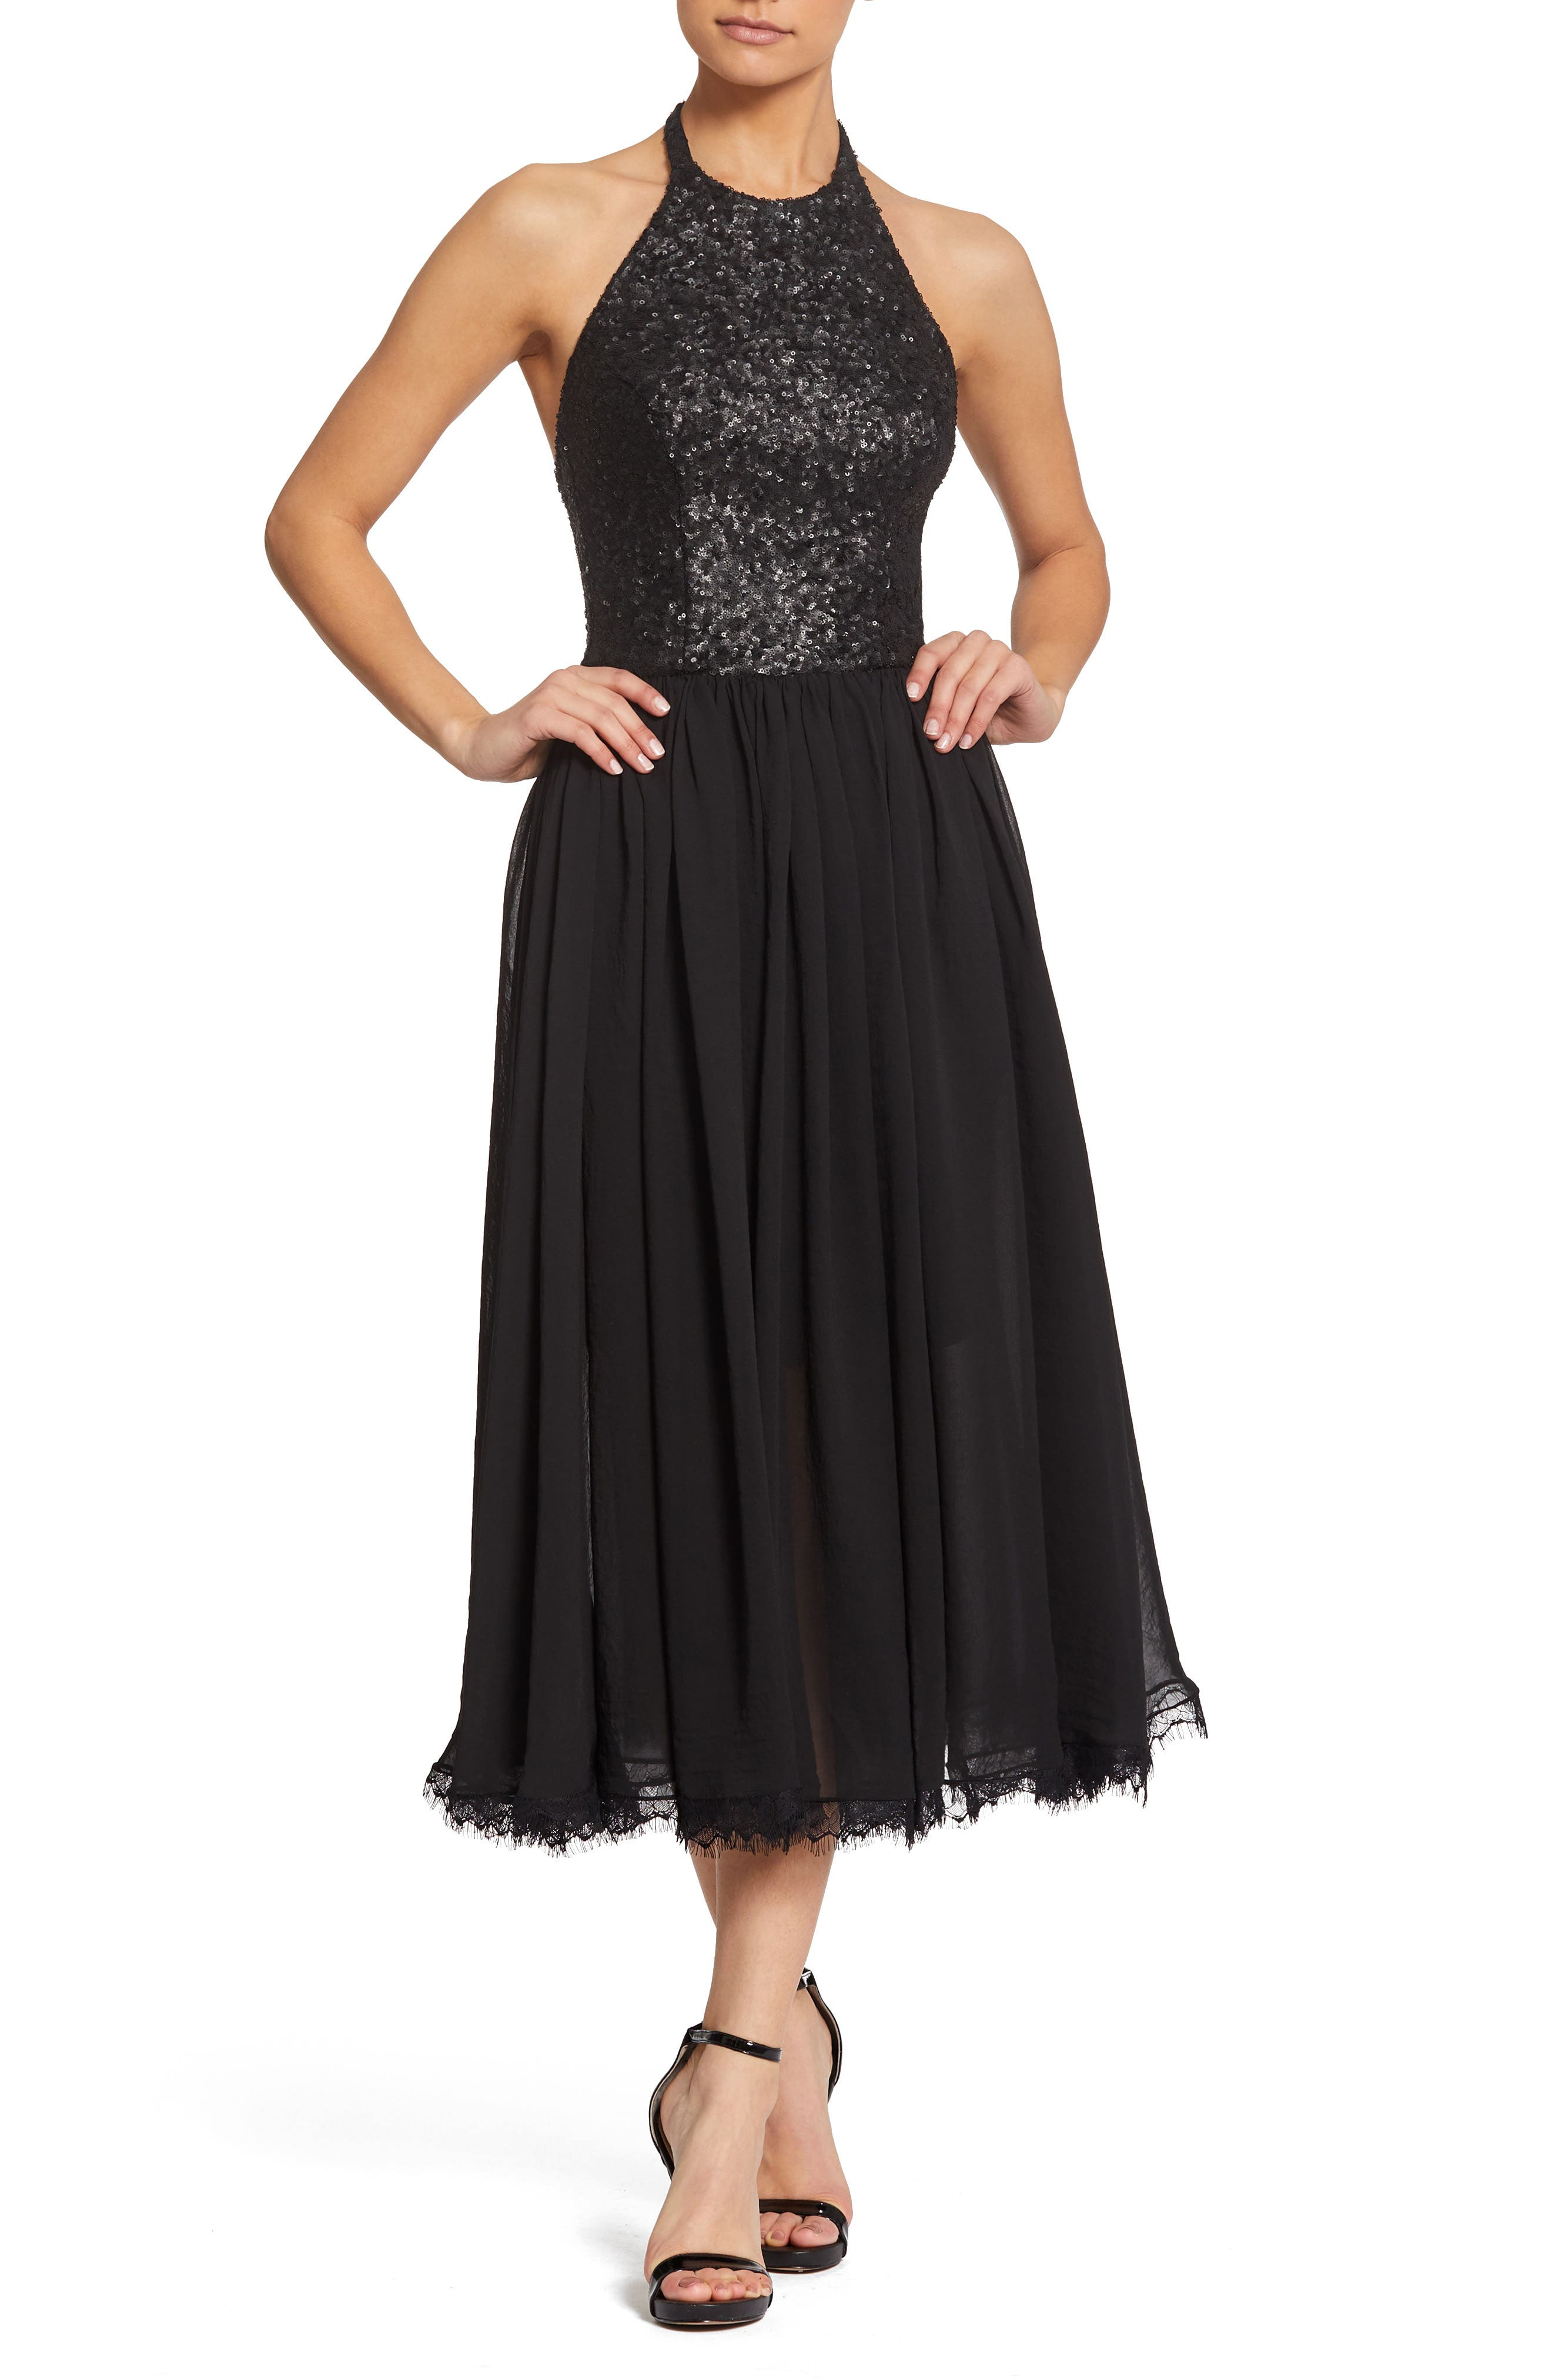 A-Line Black Cocktail Dresses